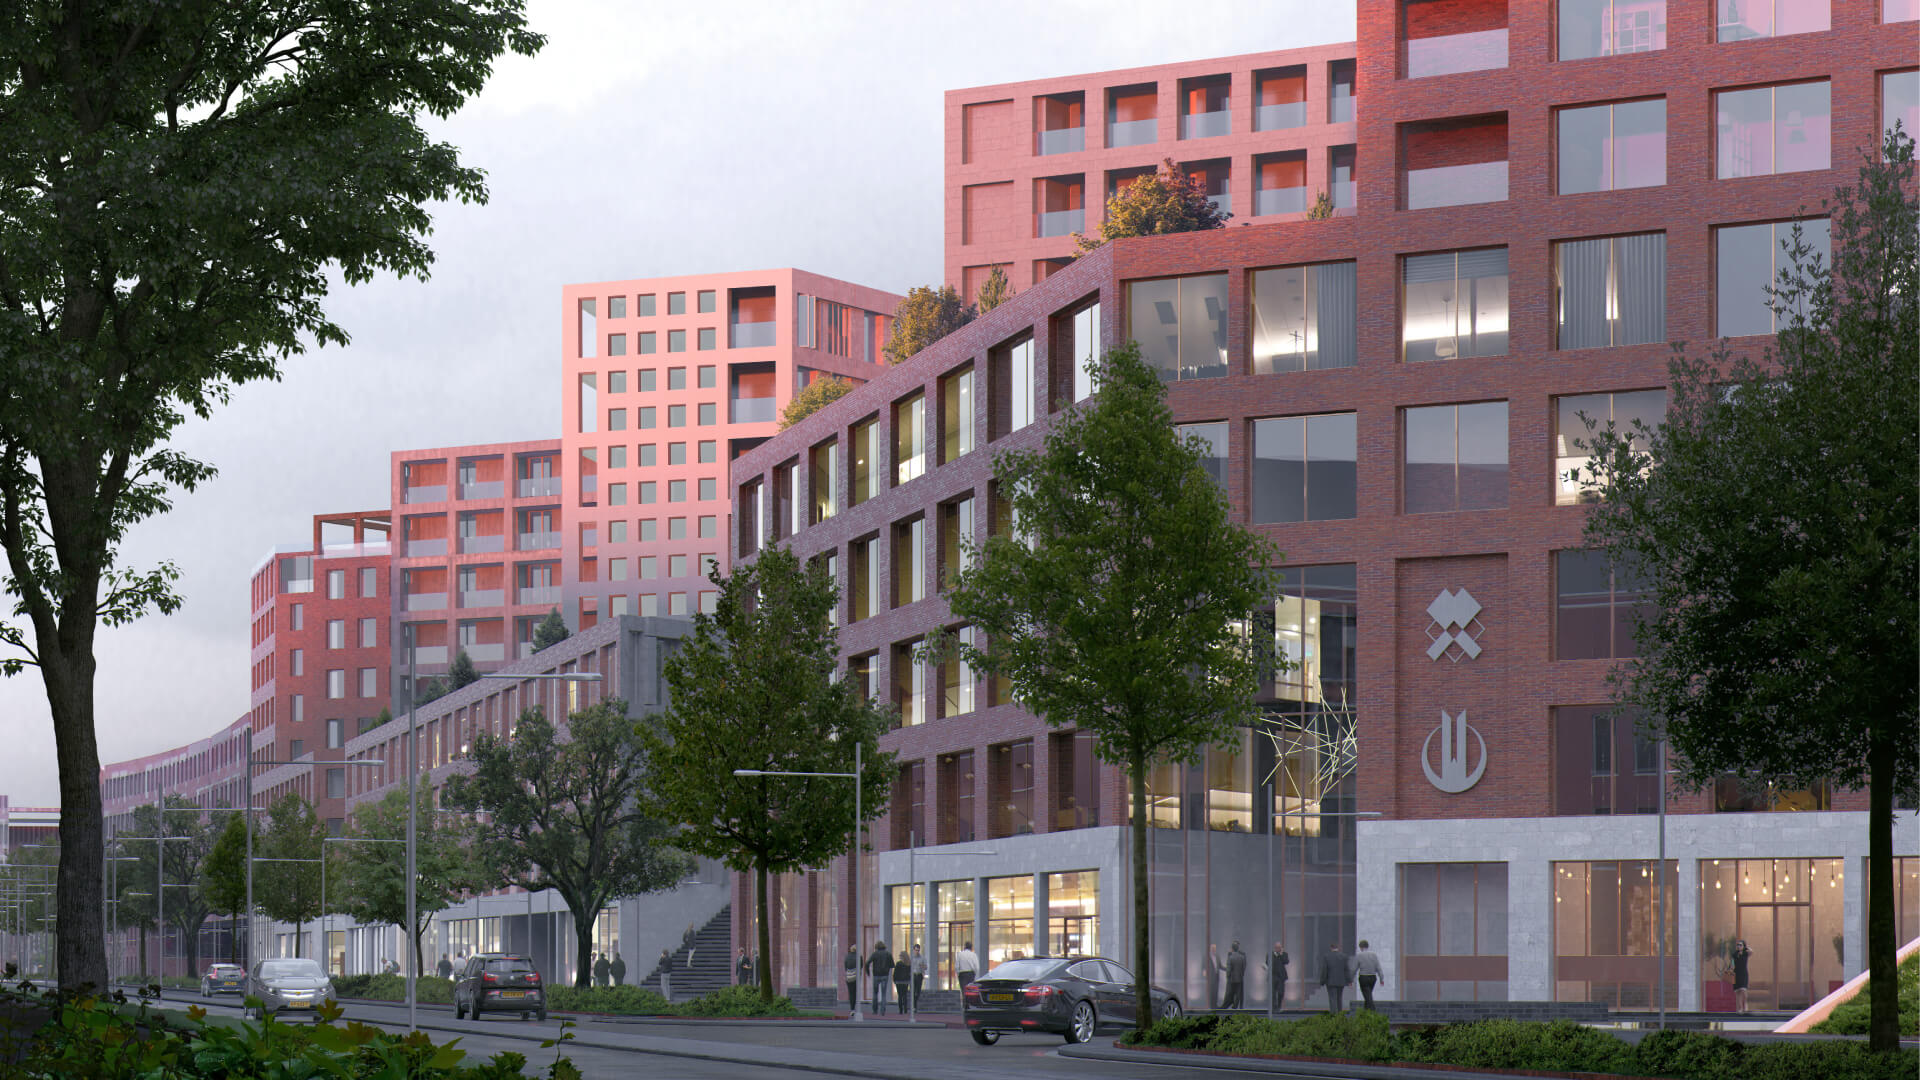 5TRACKS Breda - SYNCHROON Ontwikkelaars